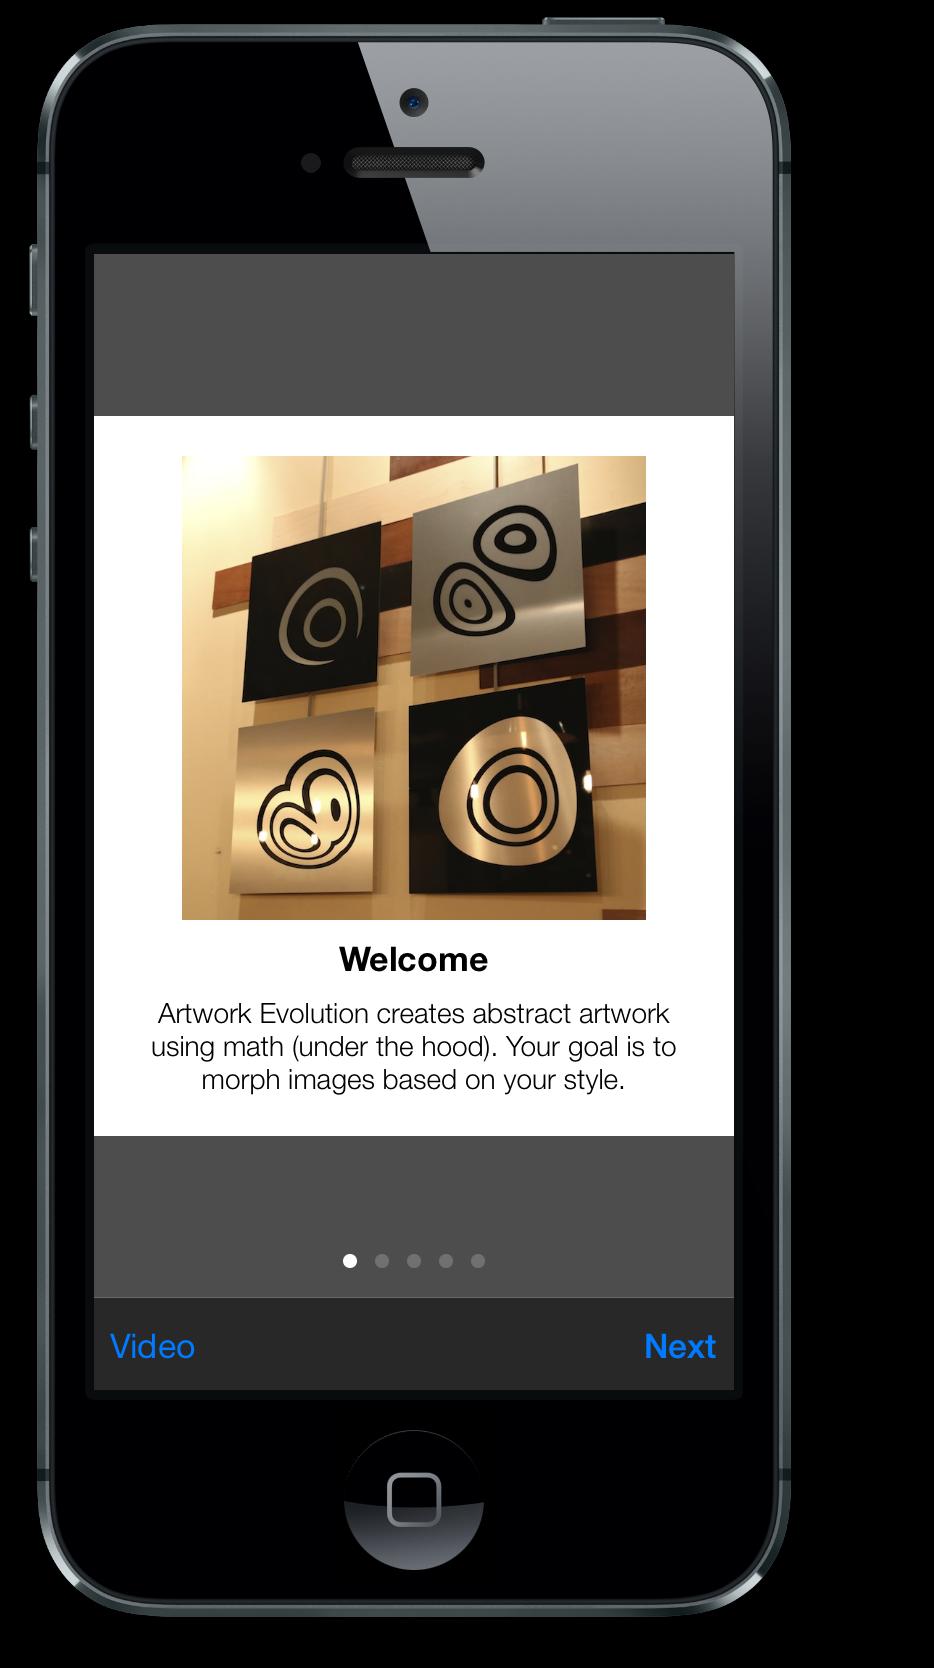 Artwork Evolution 2.0 Creates Abstract Art Using Mathematics